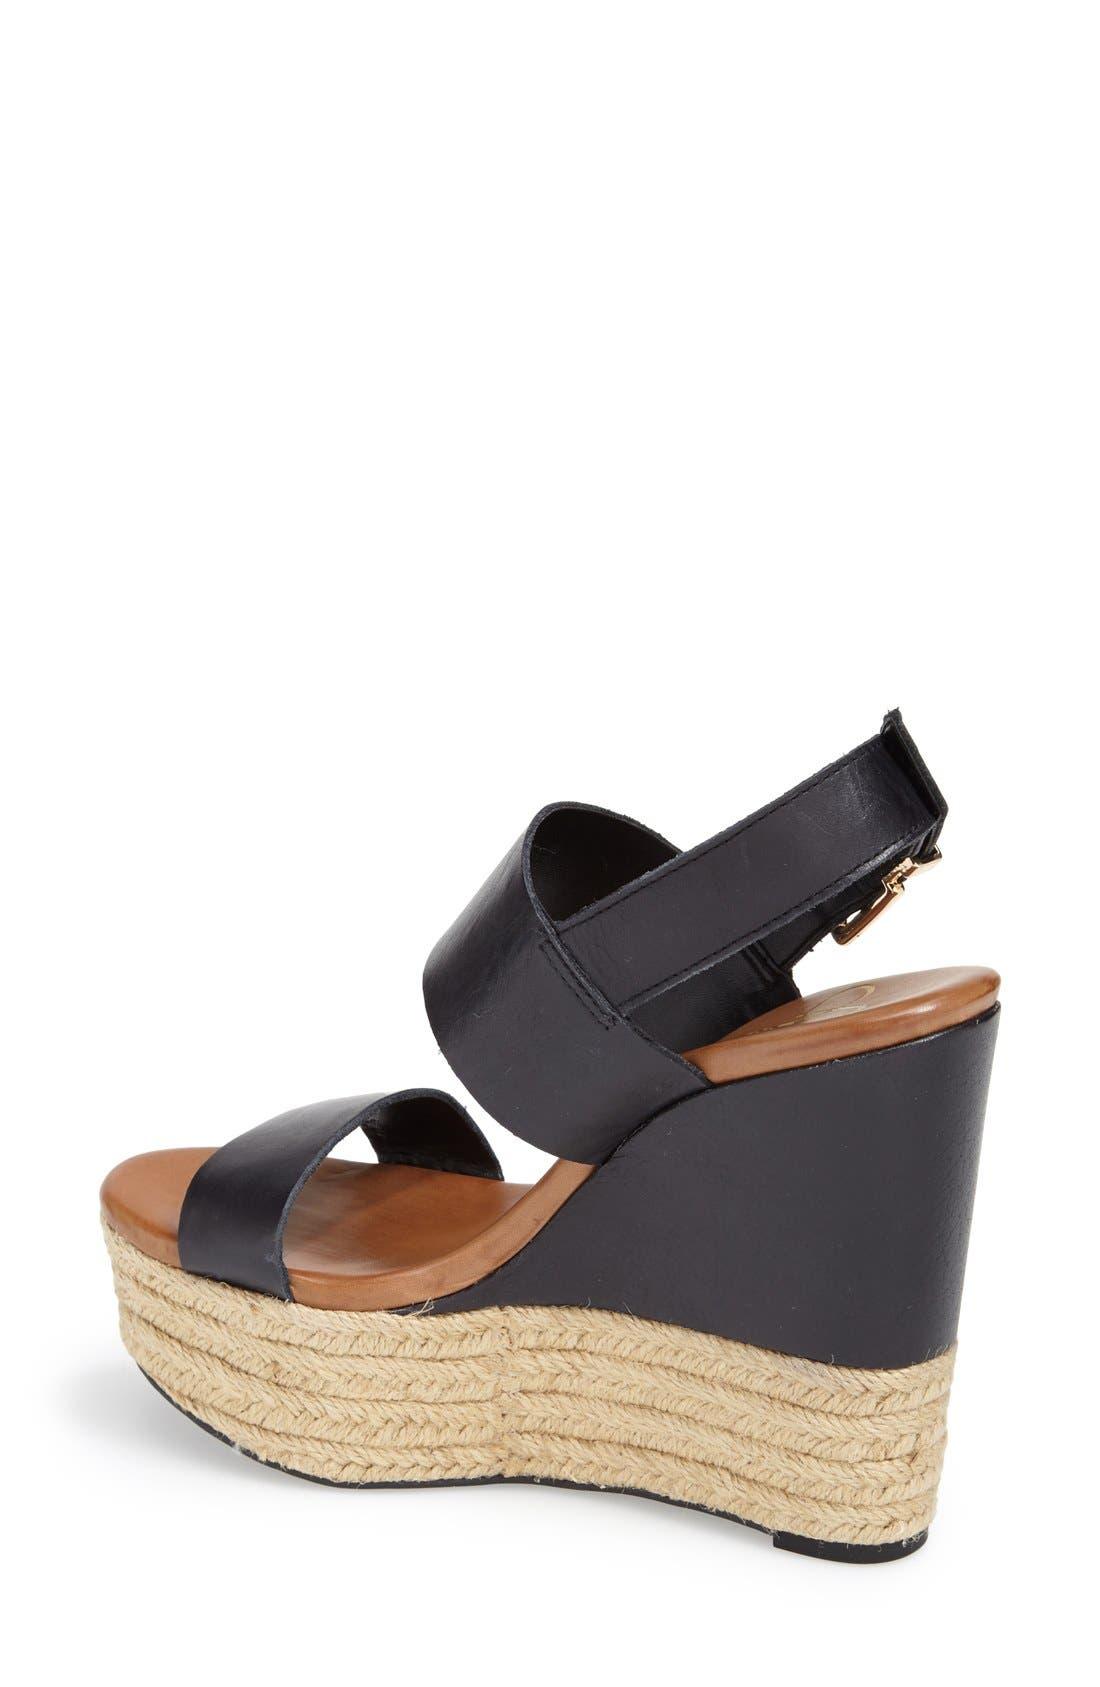 'Allyn' Wedge Platform Leather Sandal,                             Alternate thumbnail 4, color,                             001